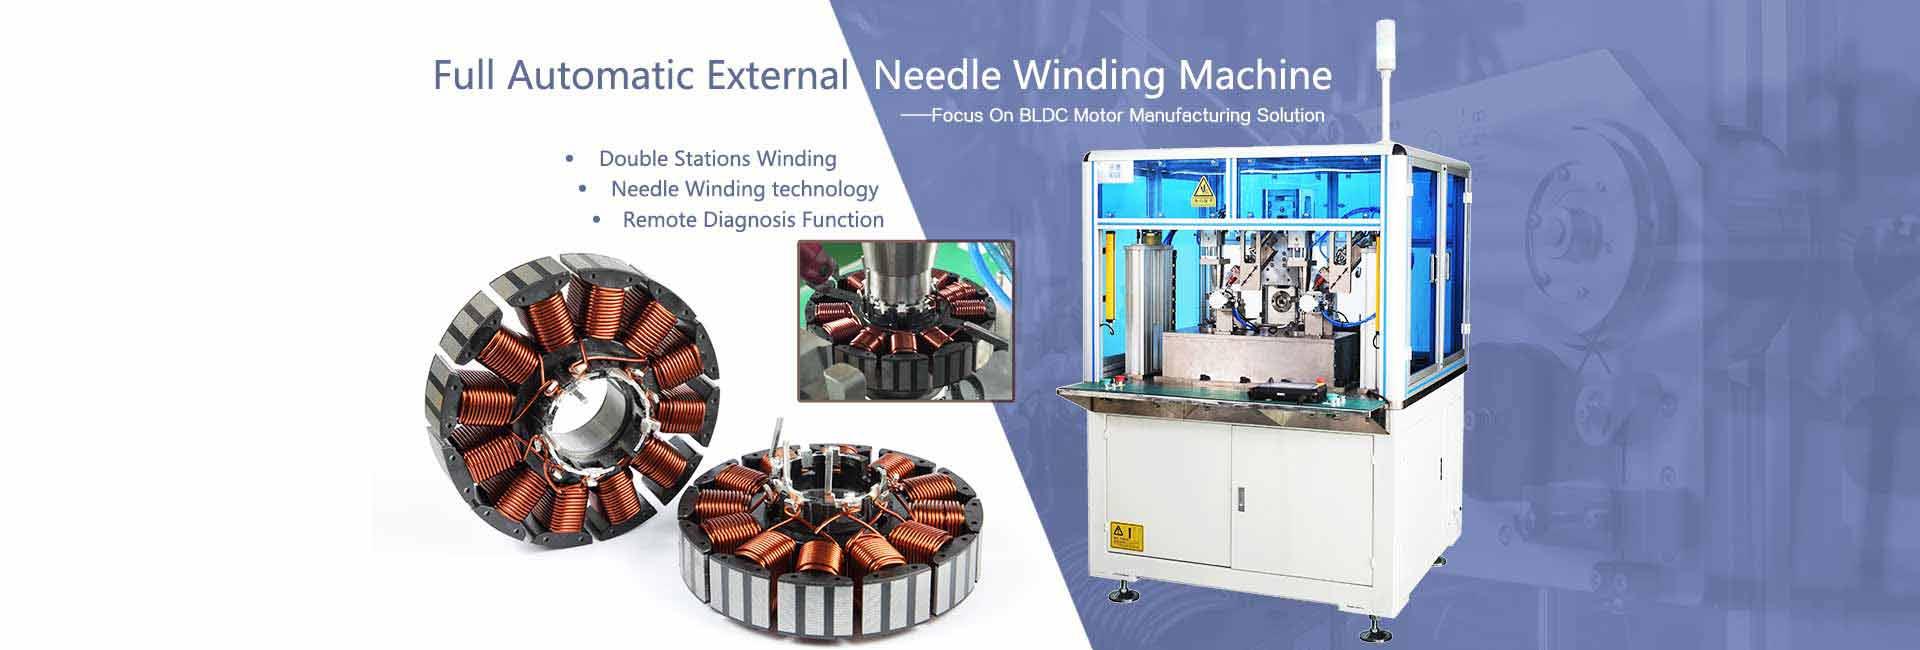 BLDC winding machine,BLDC stator manufacturing,BLDC winder